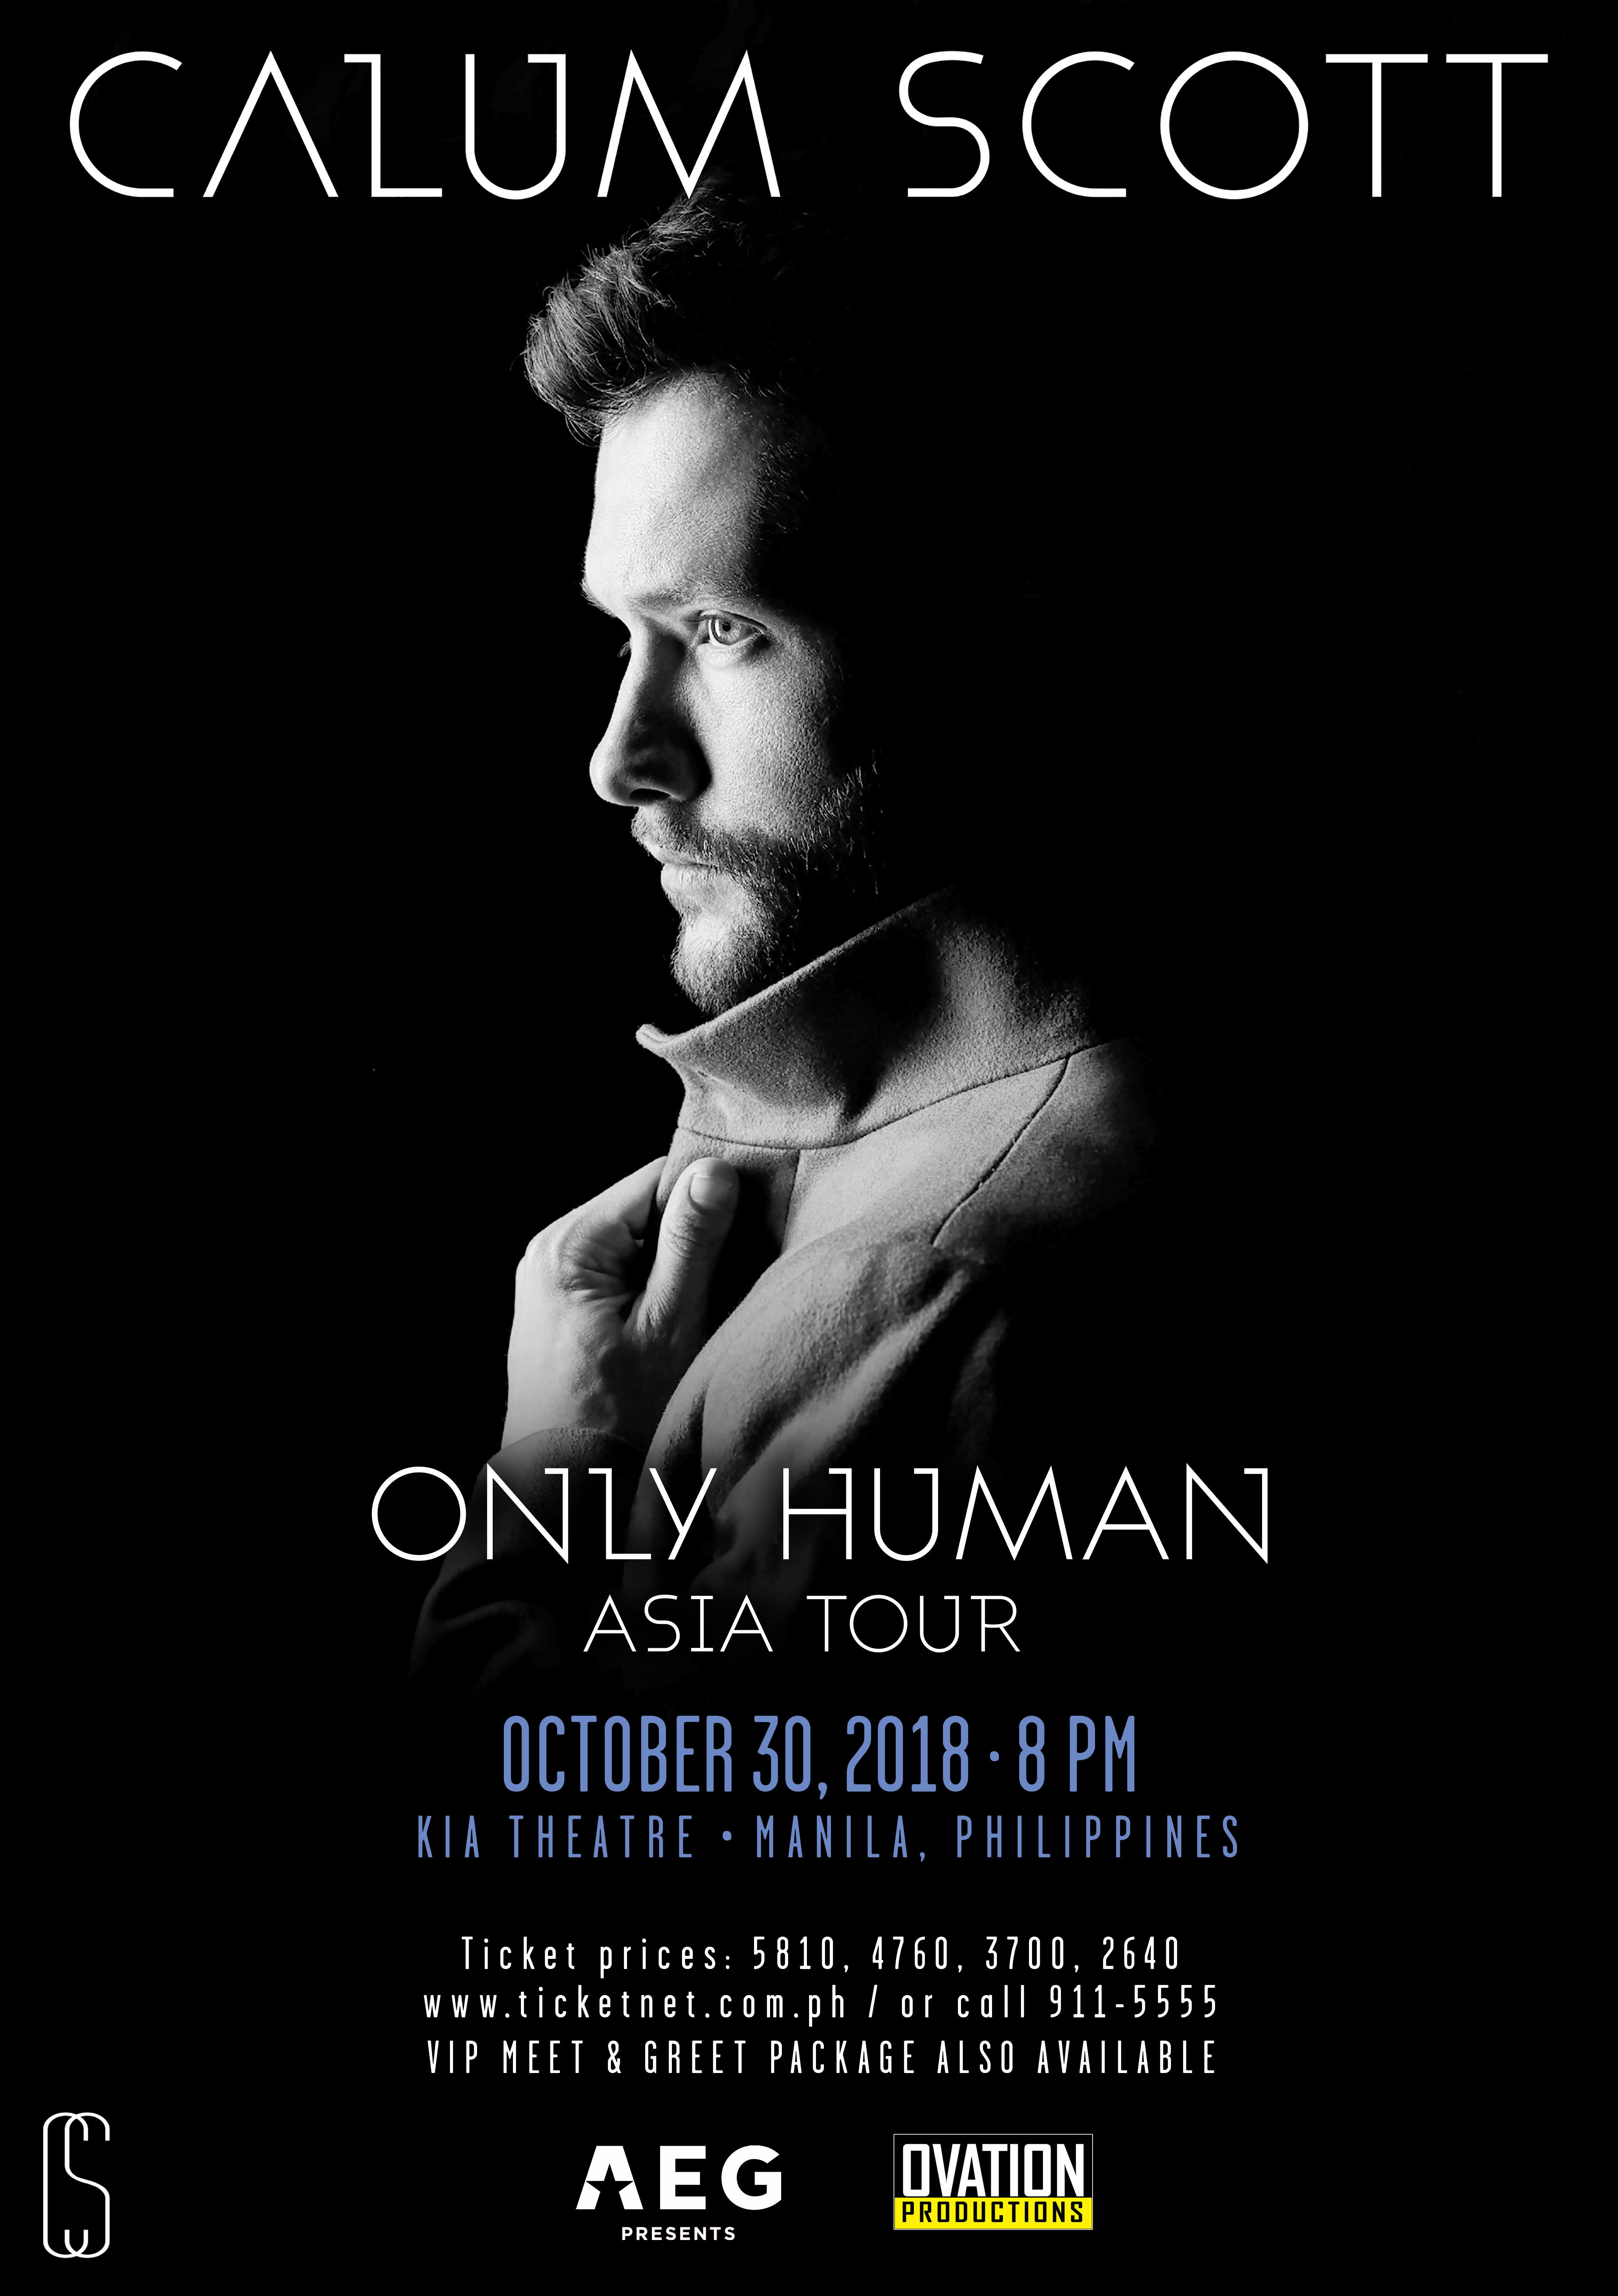 CALUM SCOTT's Only Human Asia Tour